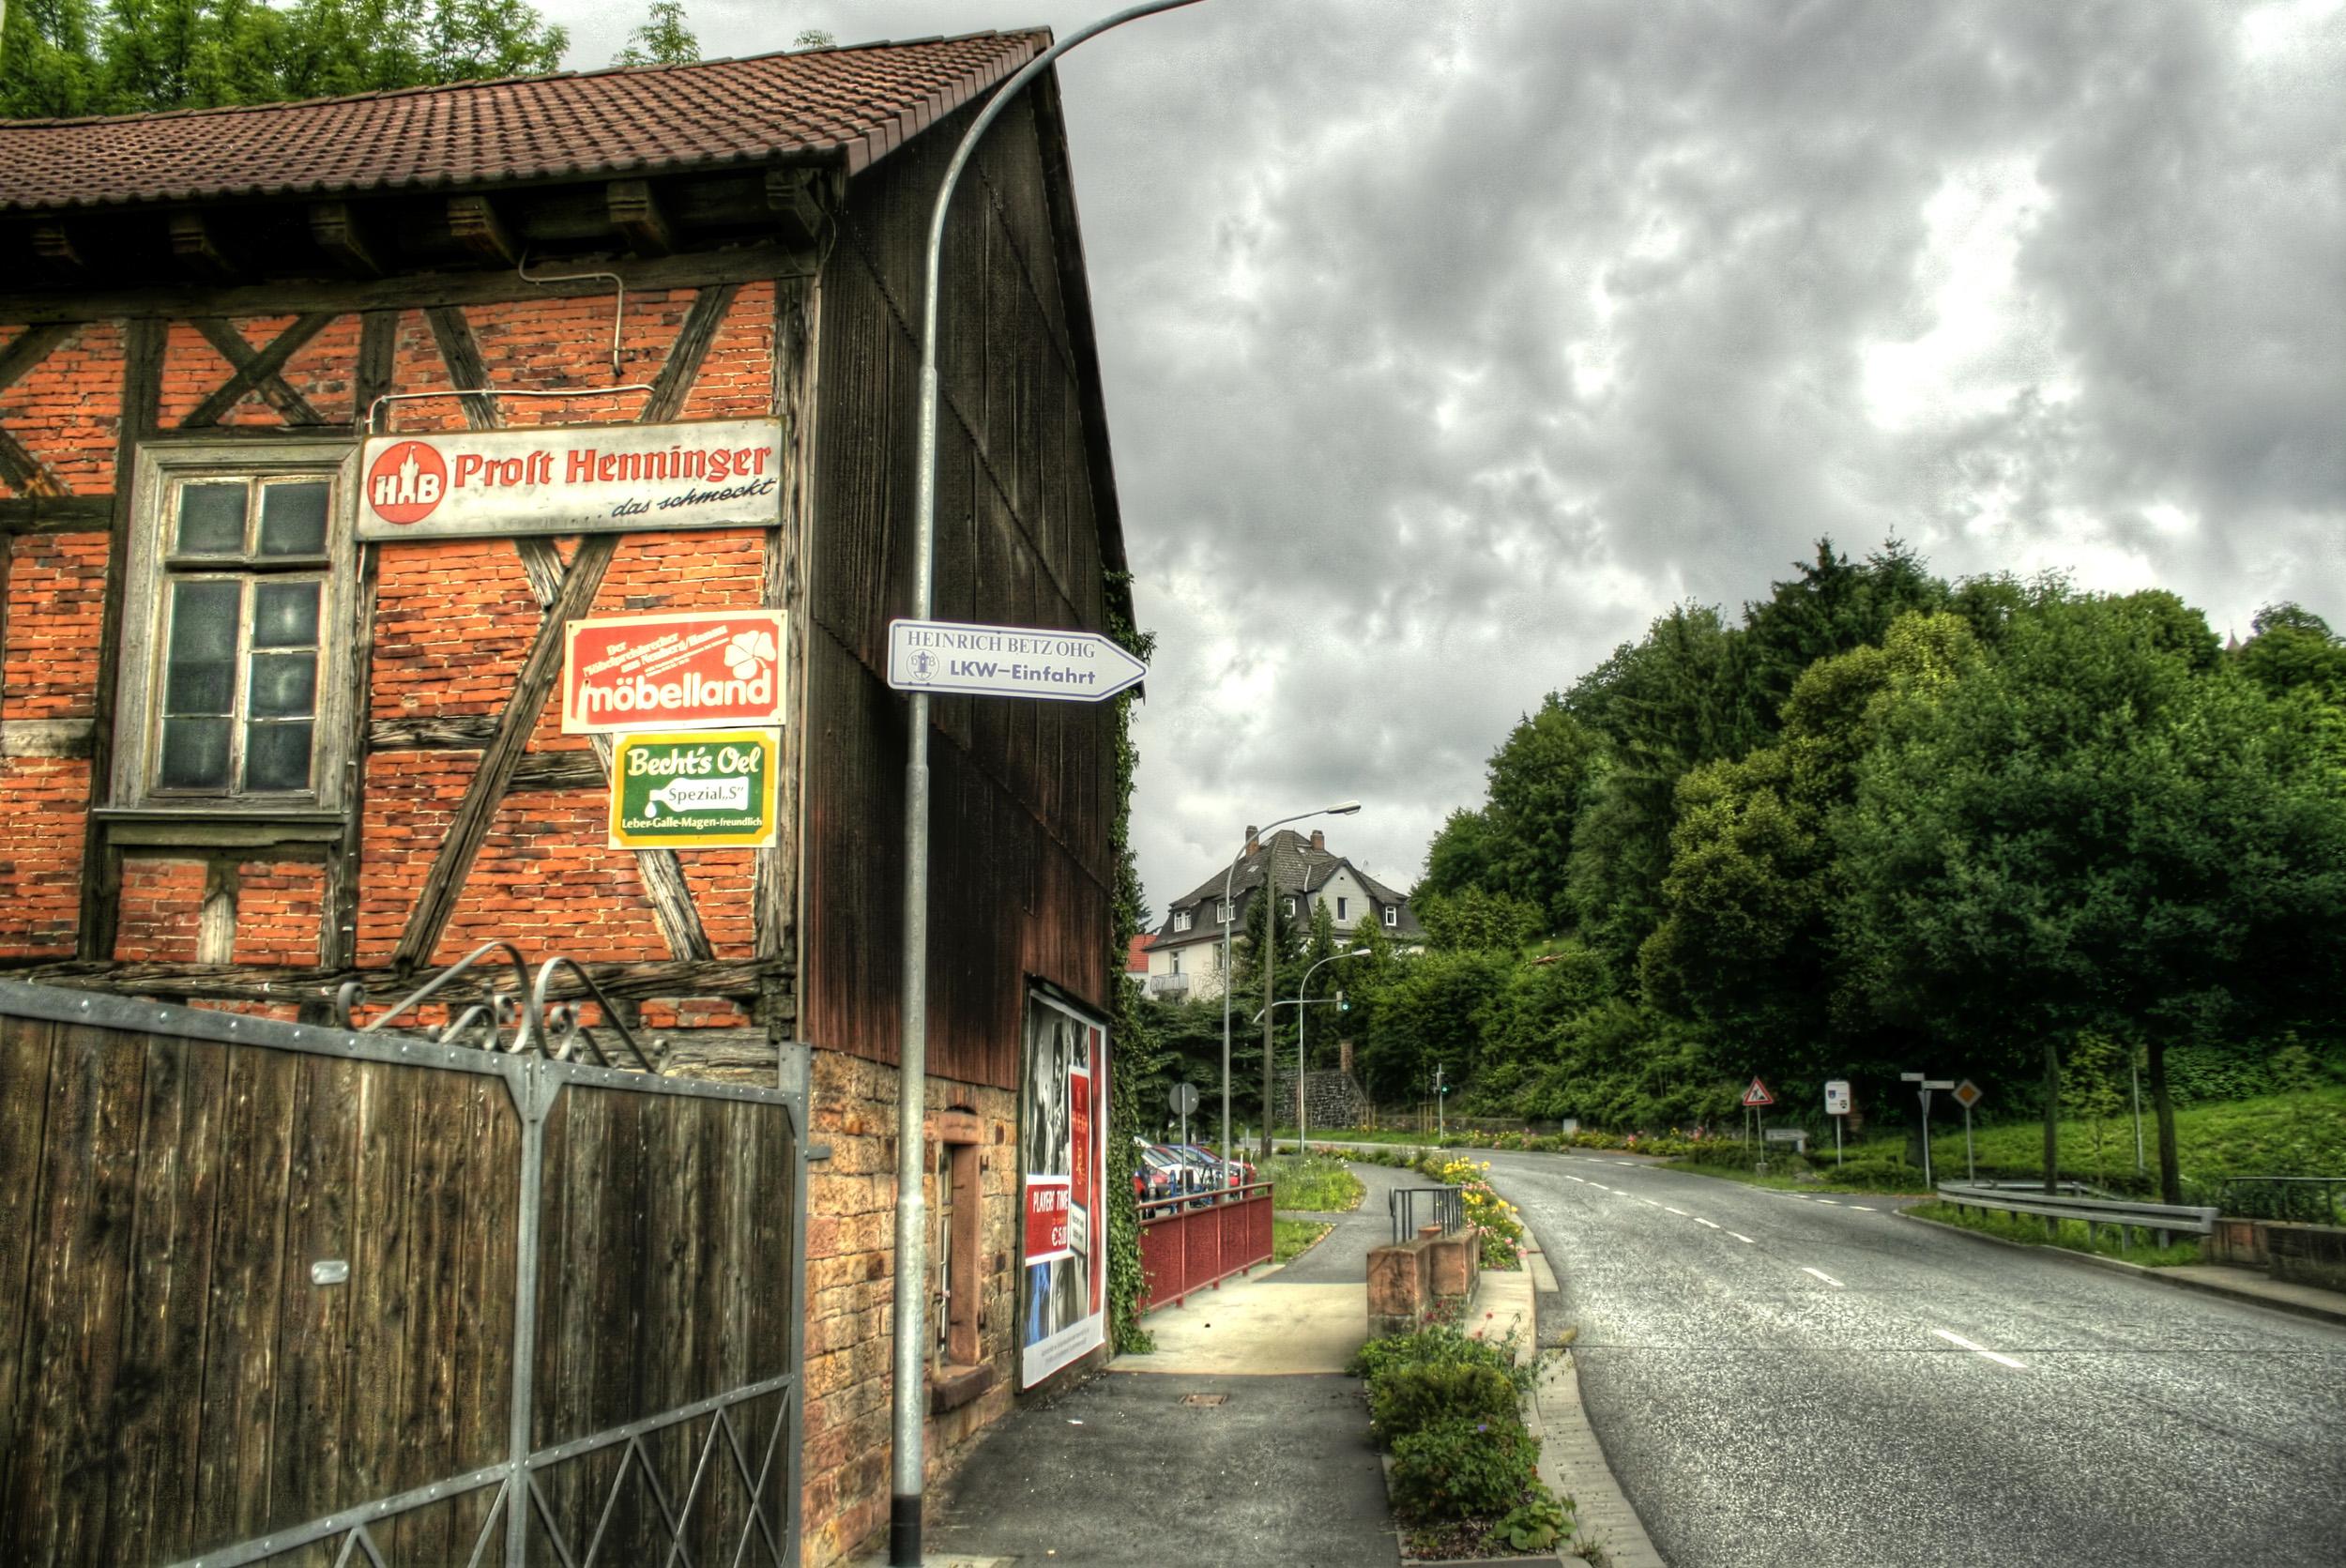 F36 Ortenberg - Lissberg, B 275, N50° 22.368 E009° 04.884 by Philipp